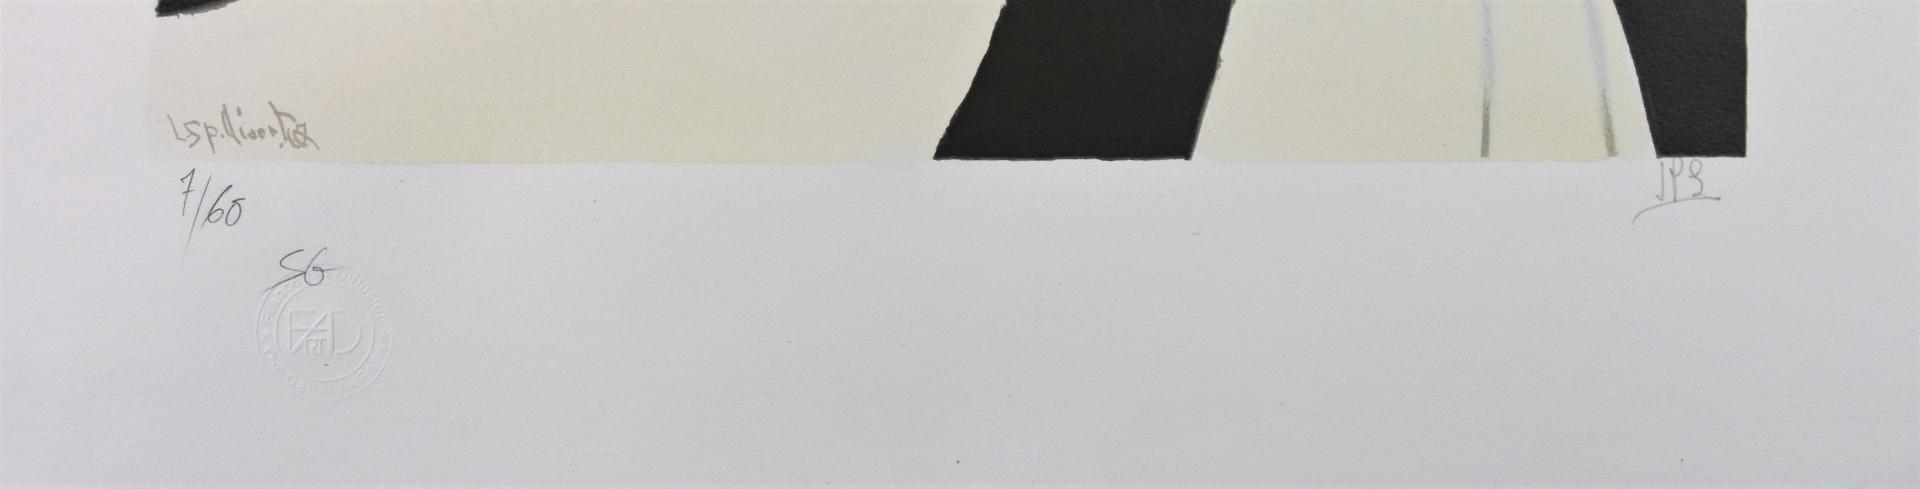 LEON SPILLIAERT,Vertige 1908,Lithographie